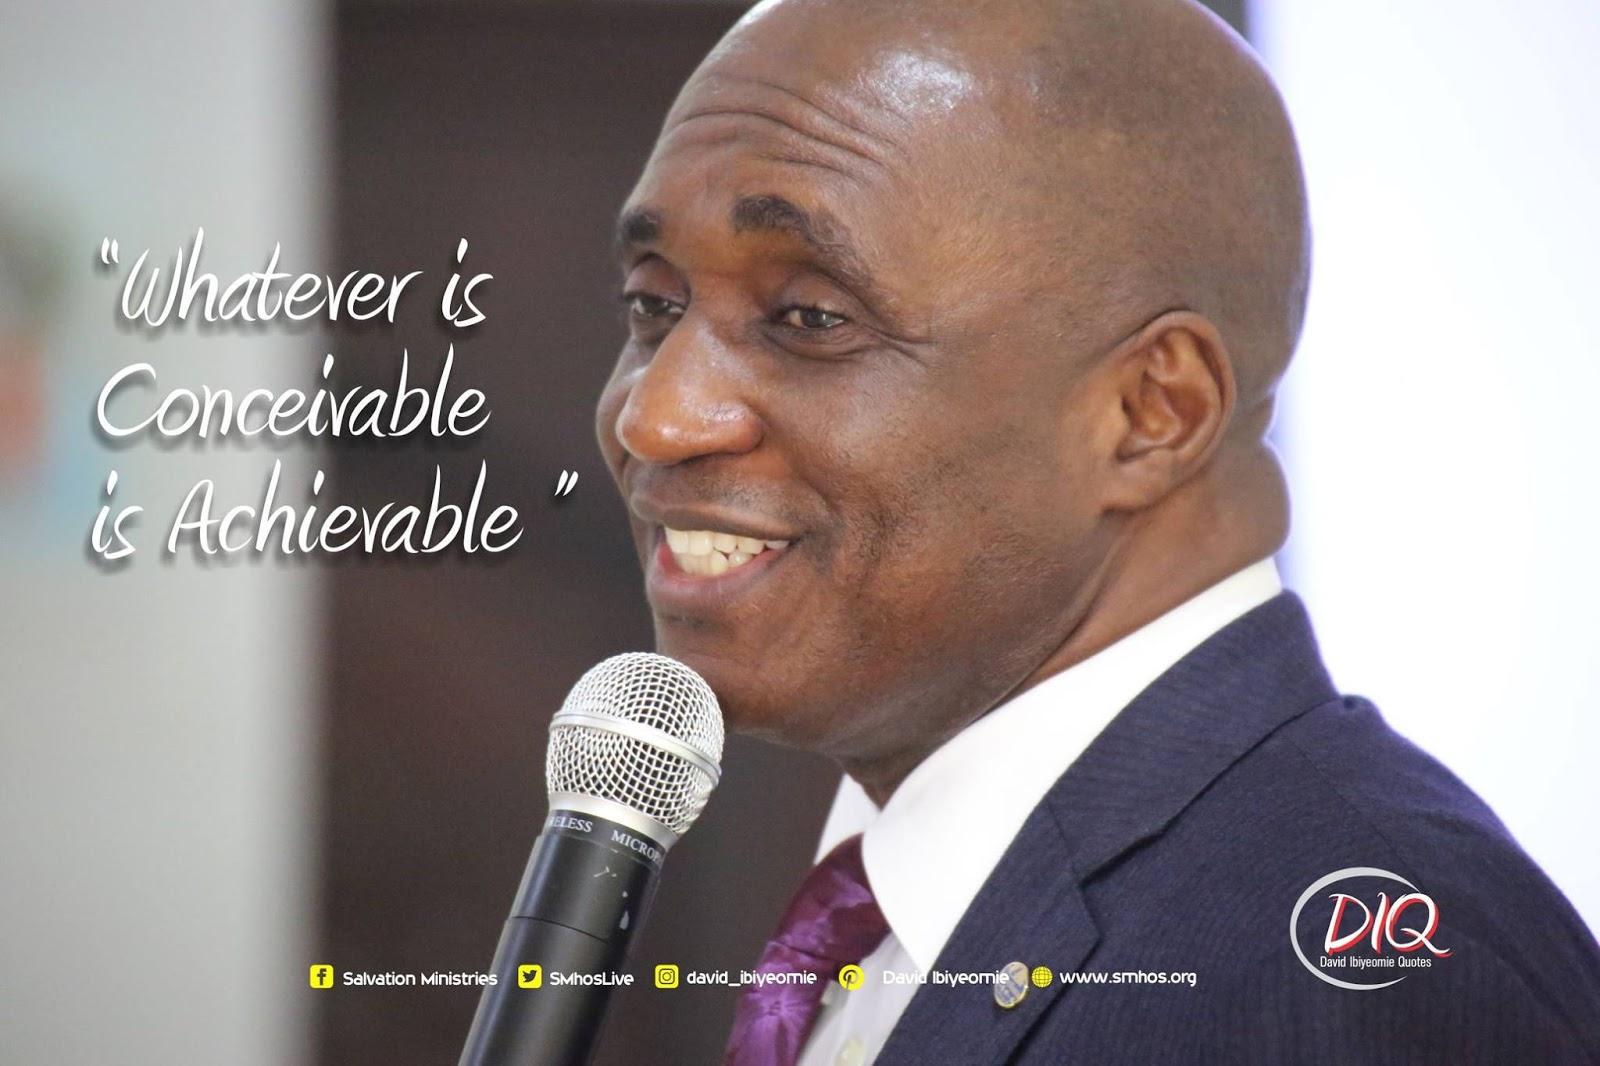 David Ibiyeomie: WISDOM FOR ABUNDANCE - by David Ibiyeomie